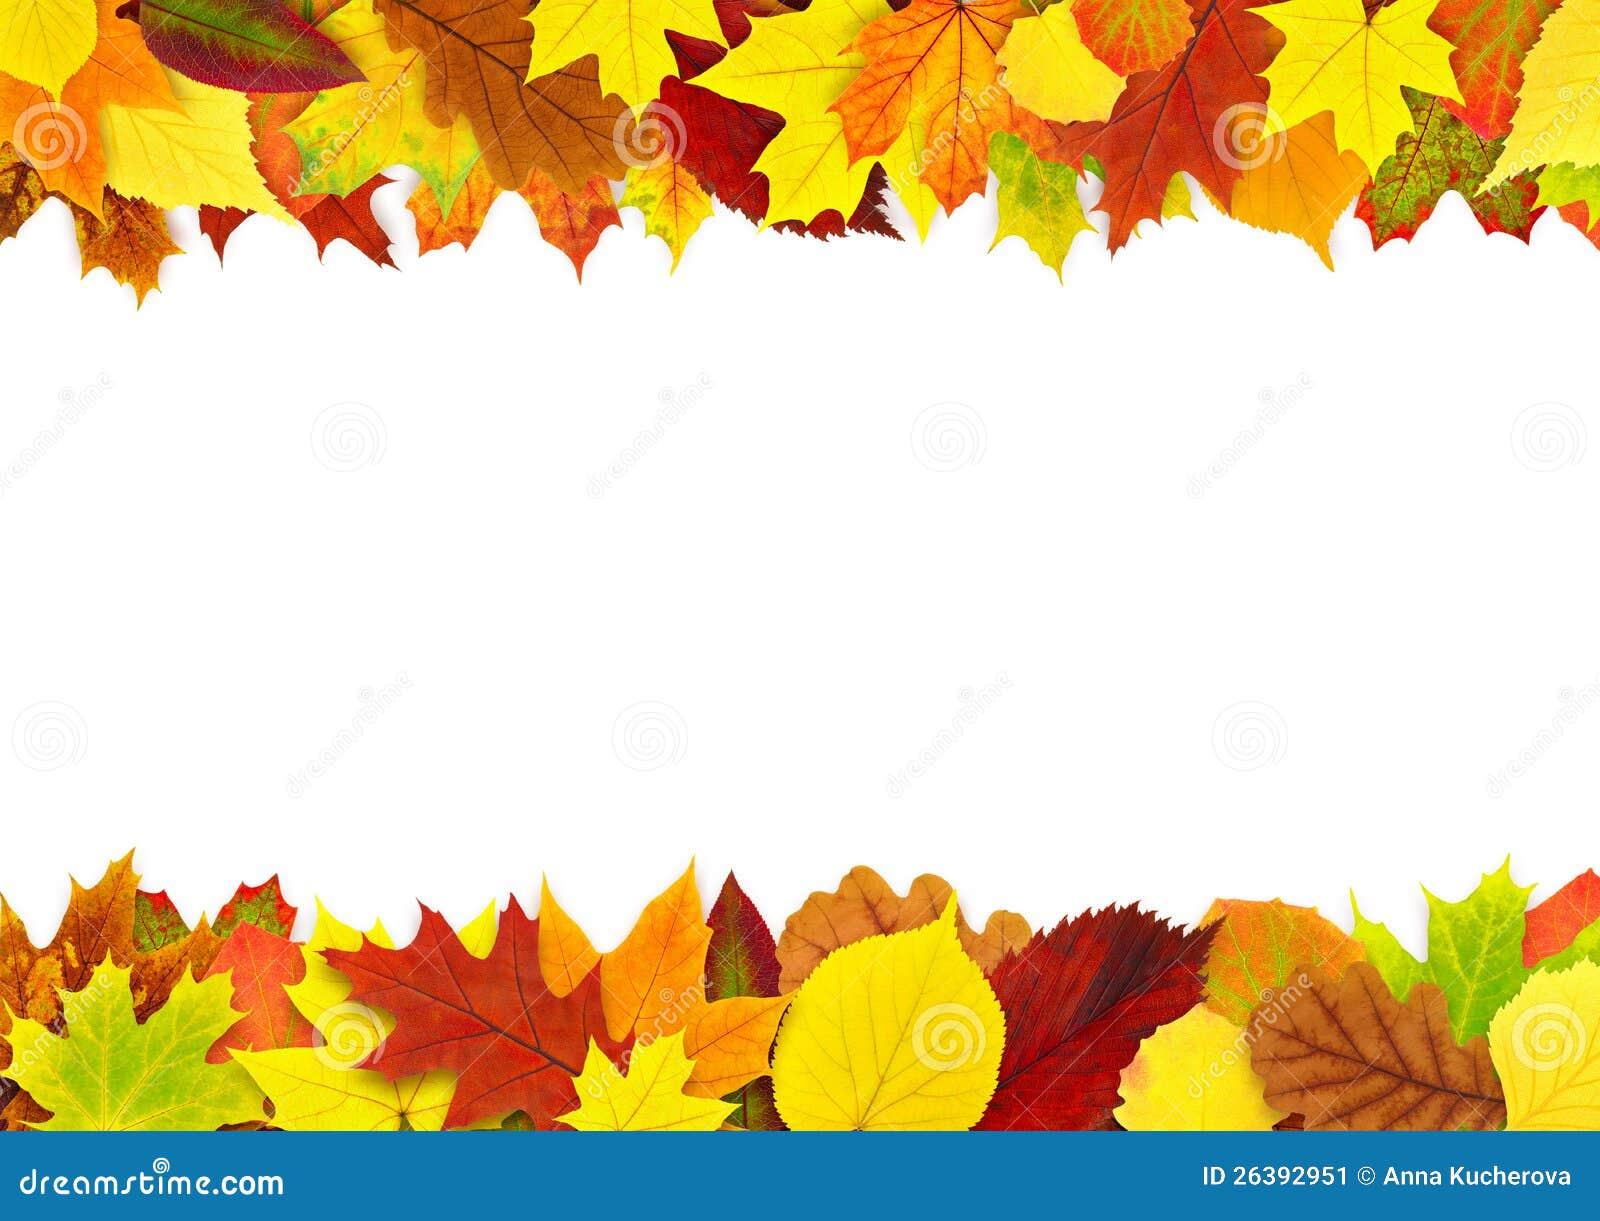 Colorful Autumn Leaves Border Stock Image Image 26392951